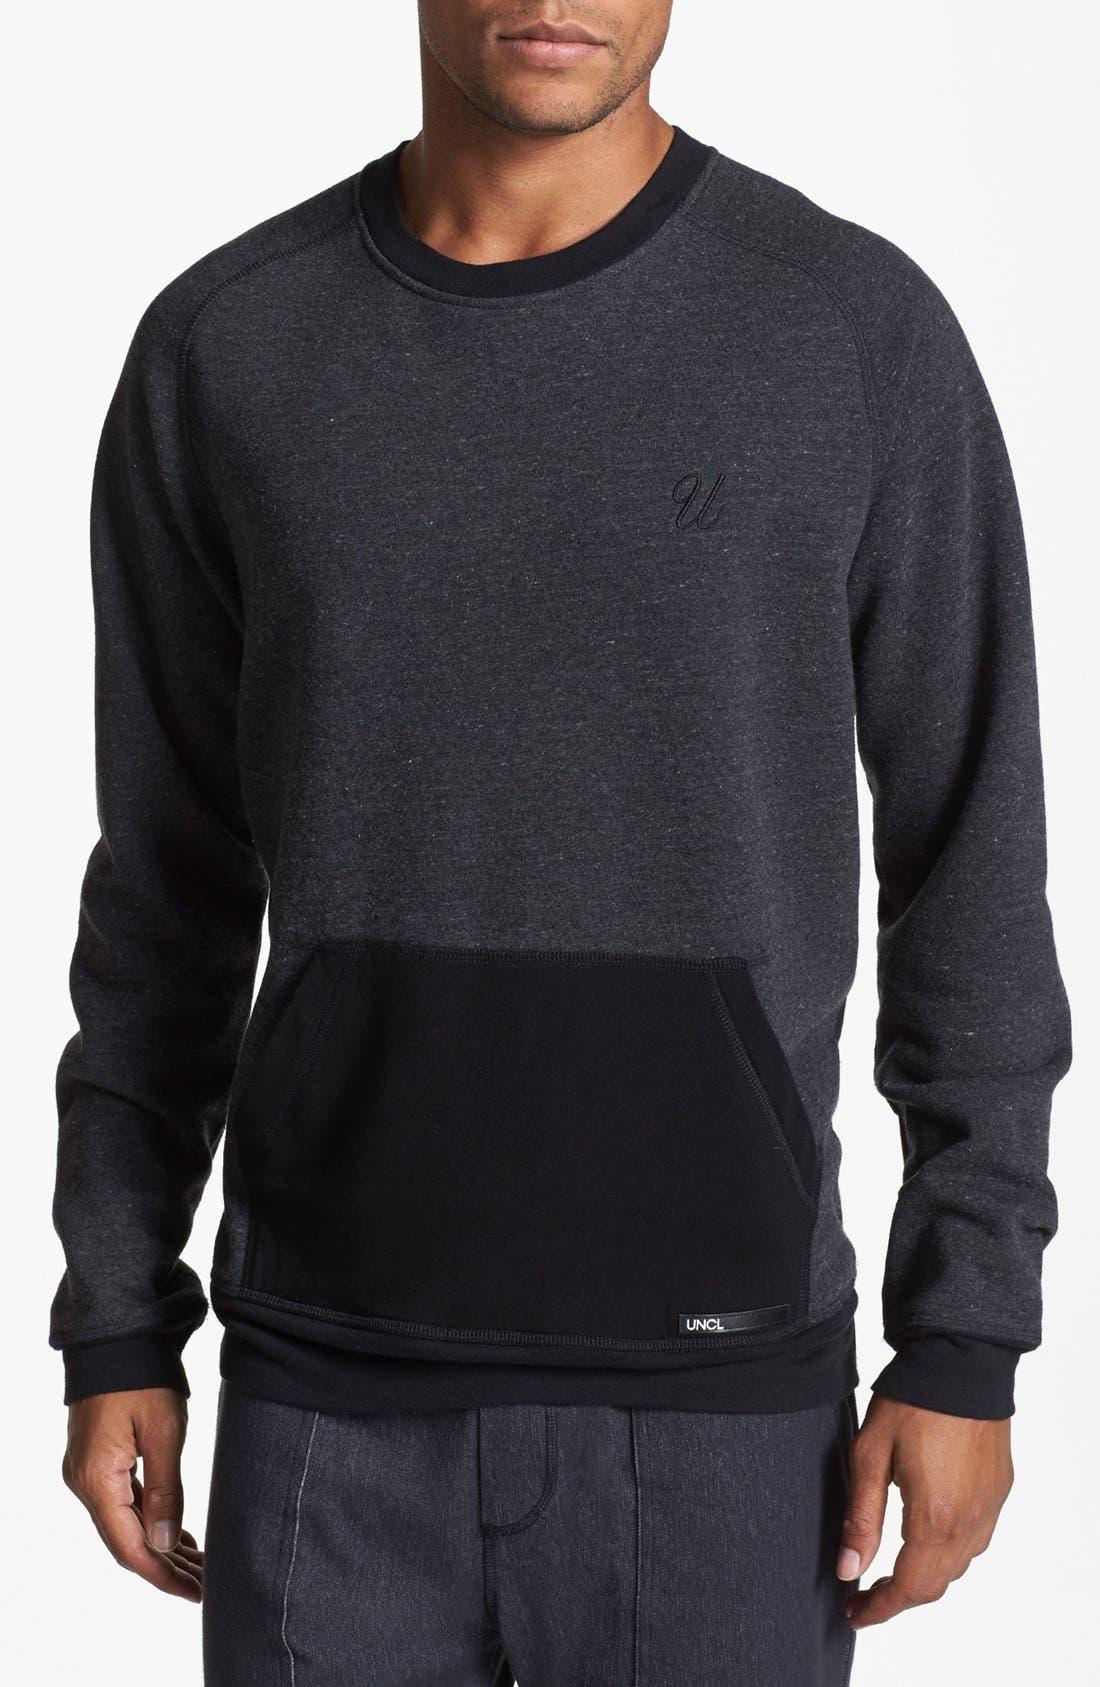 Alternate Image 1 Selected - UNCL Raglan Crewneck Sweater